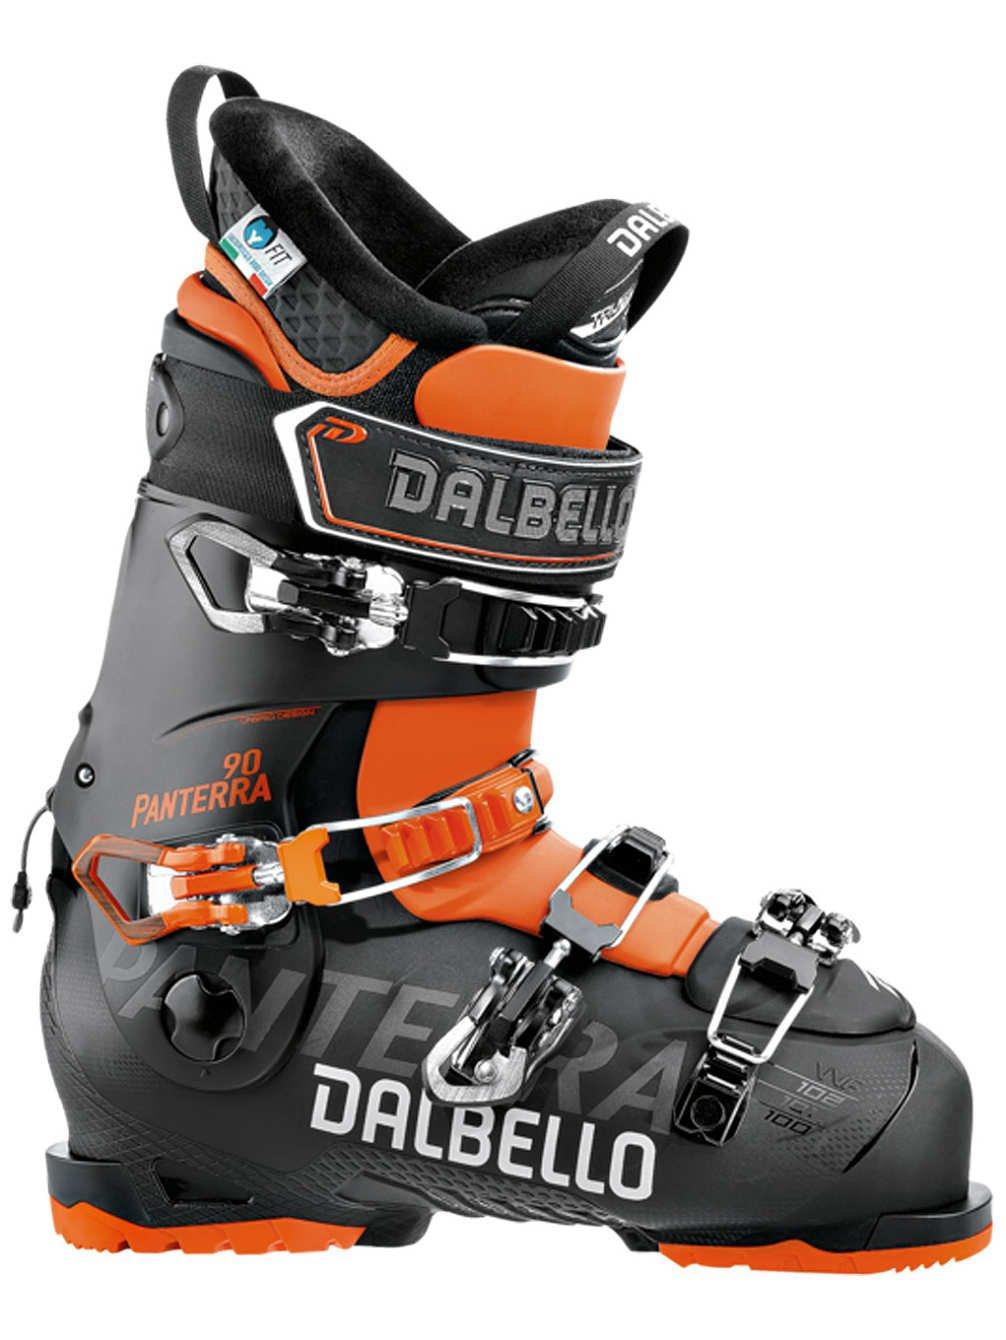 Dalbello Panterra 90 Ski Boots 2018 - 26.5/Black-Orange